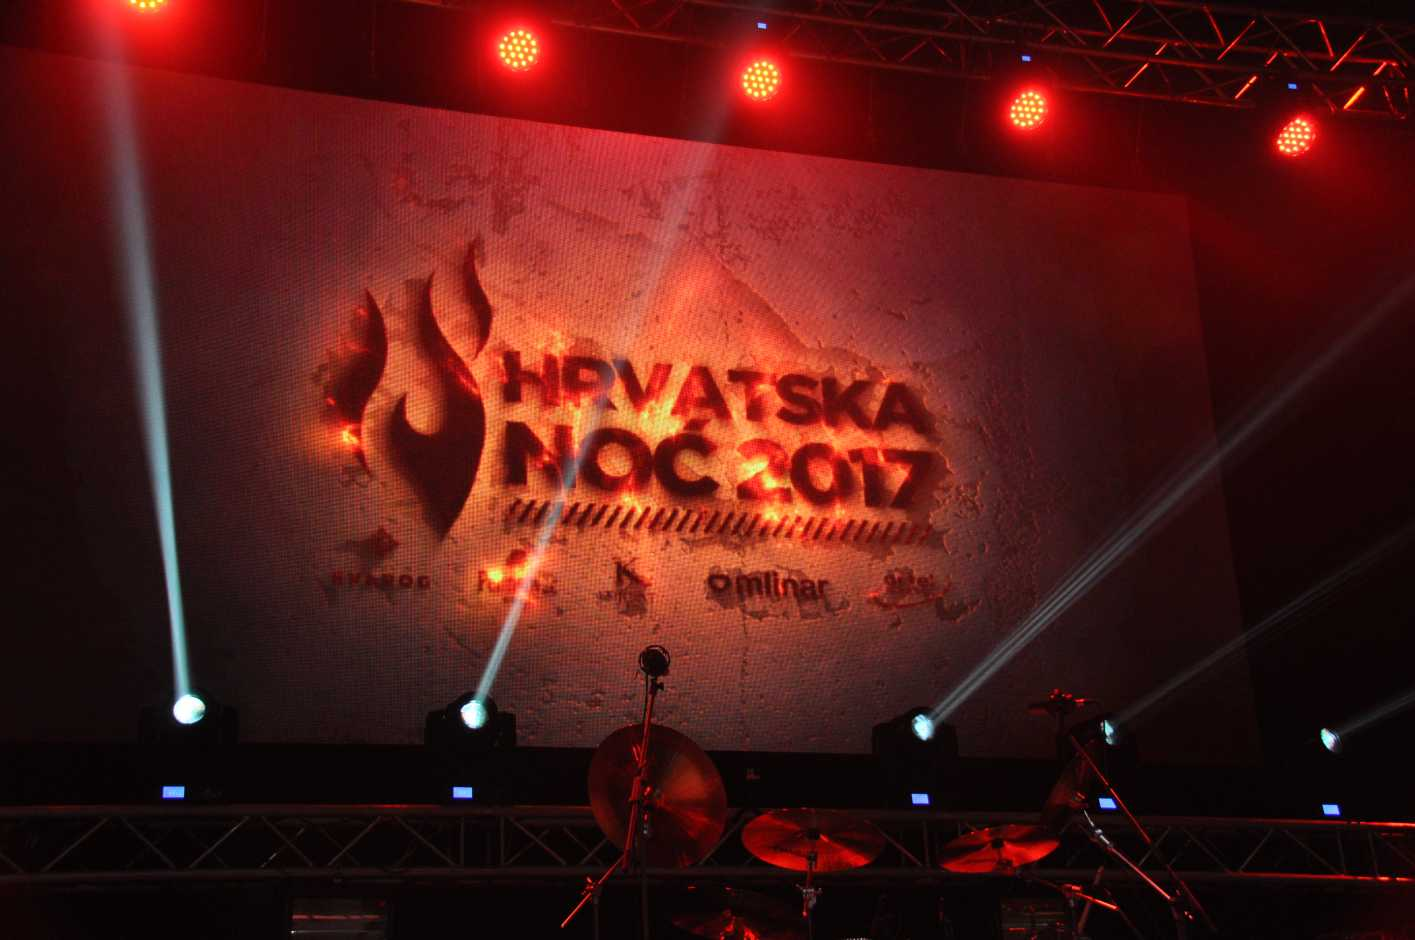 hrv noc 2017 (3)